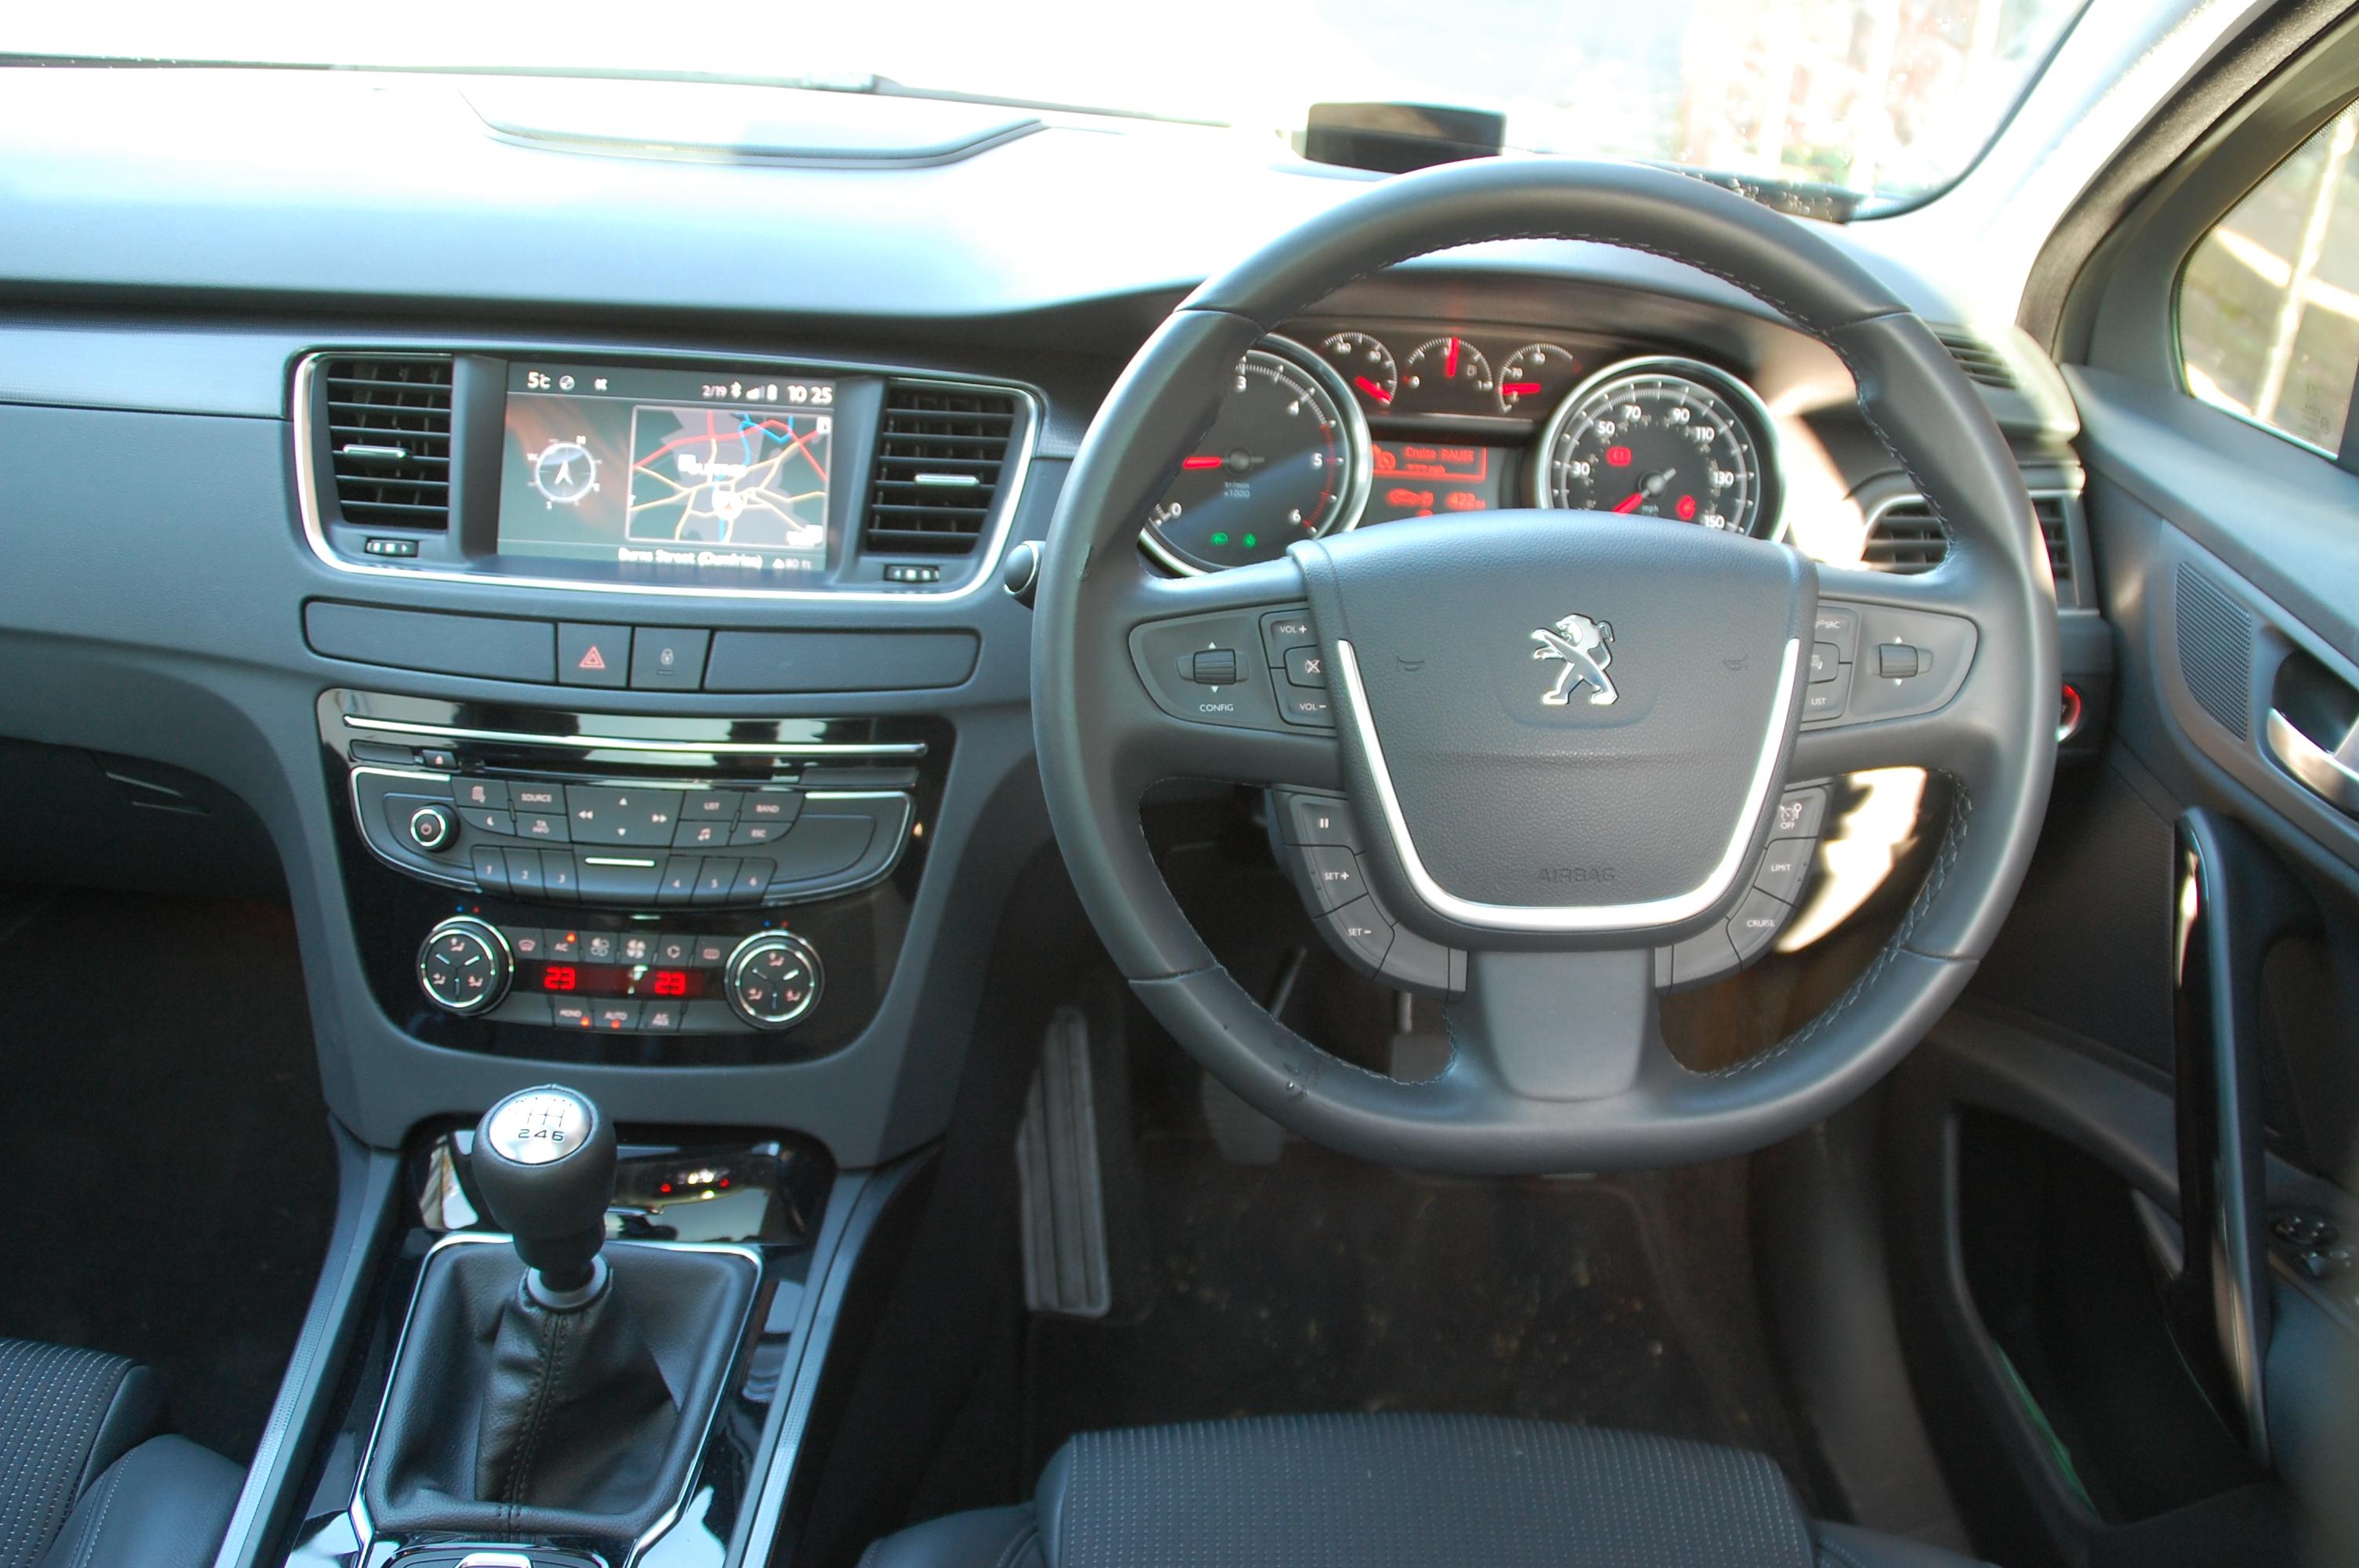 Peugeot 3008 Access >> Peugeot 508 SW Allure HDi 163 FAP Road Test « Petroleum Vitae